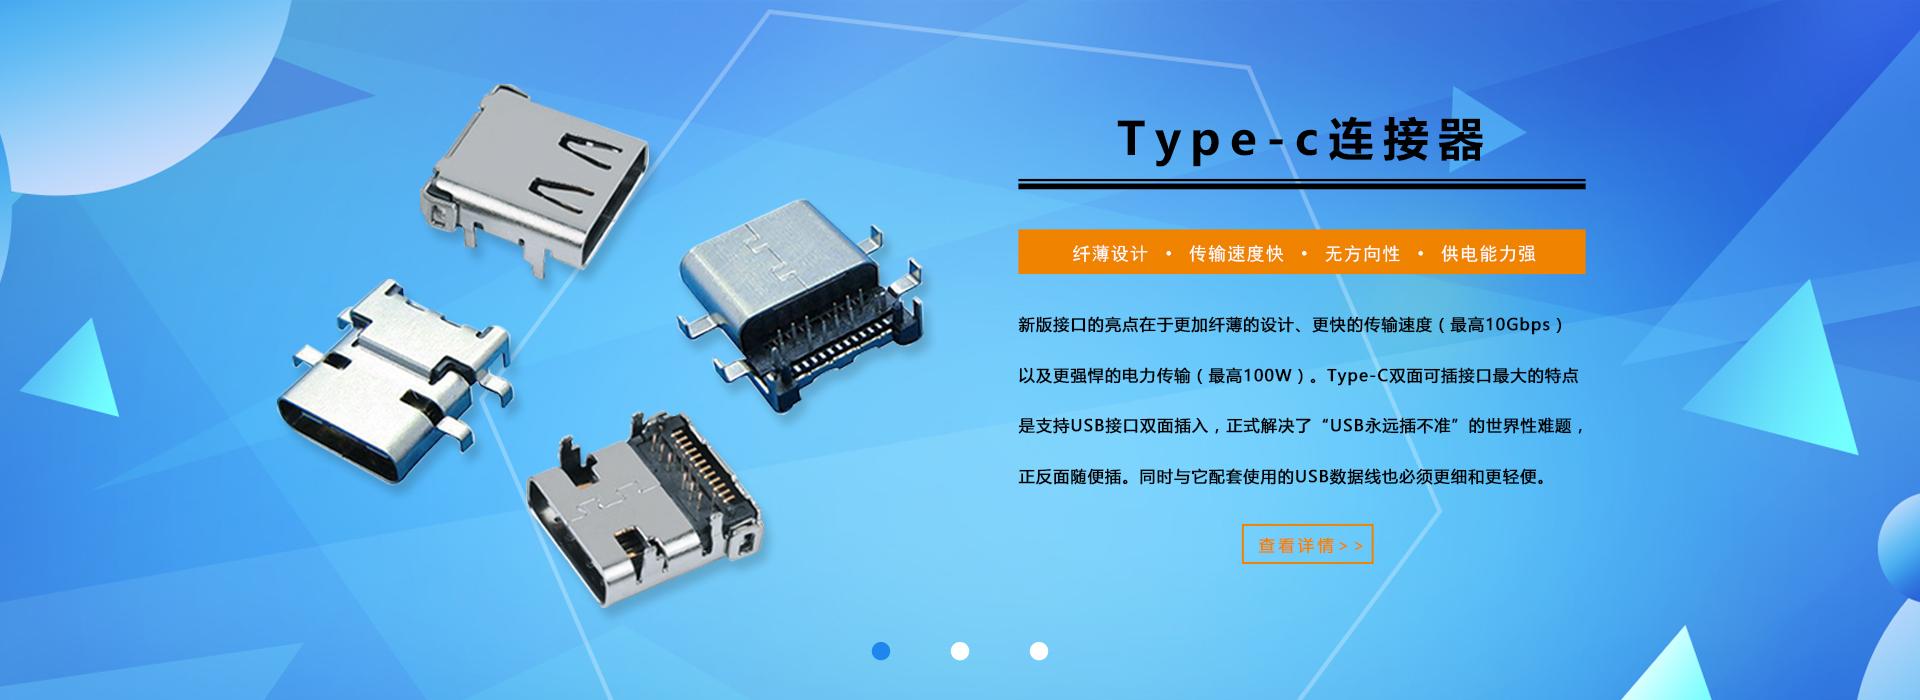 type-c厂家